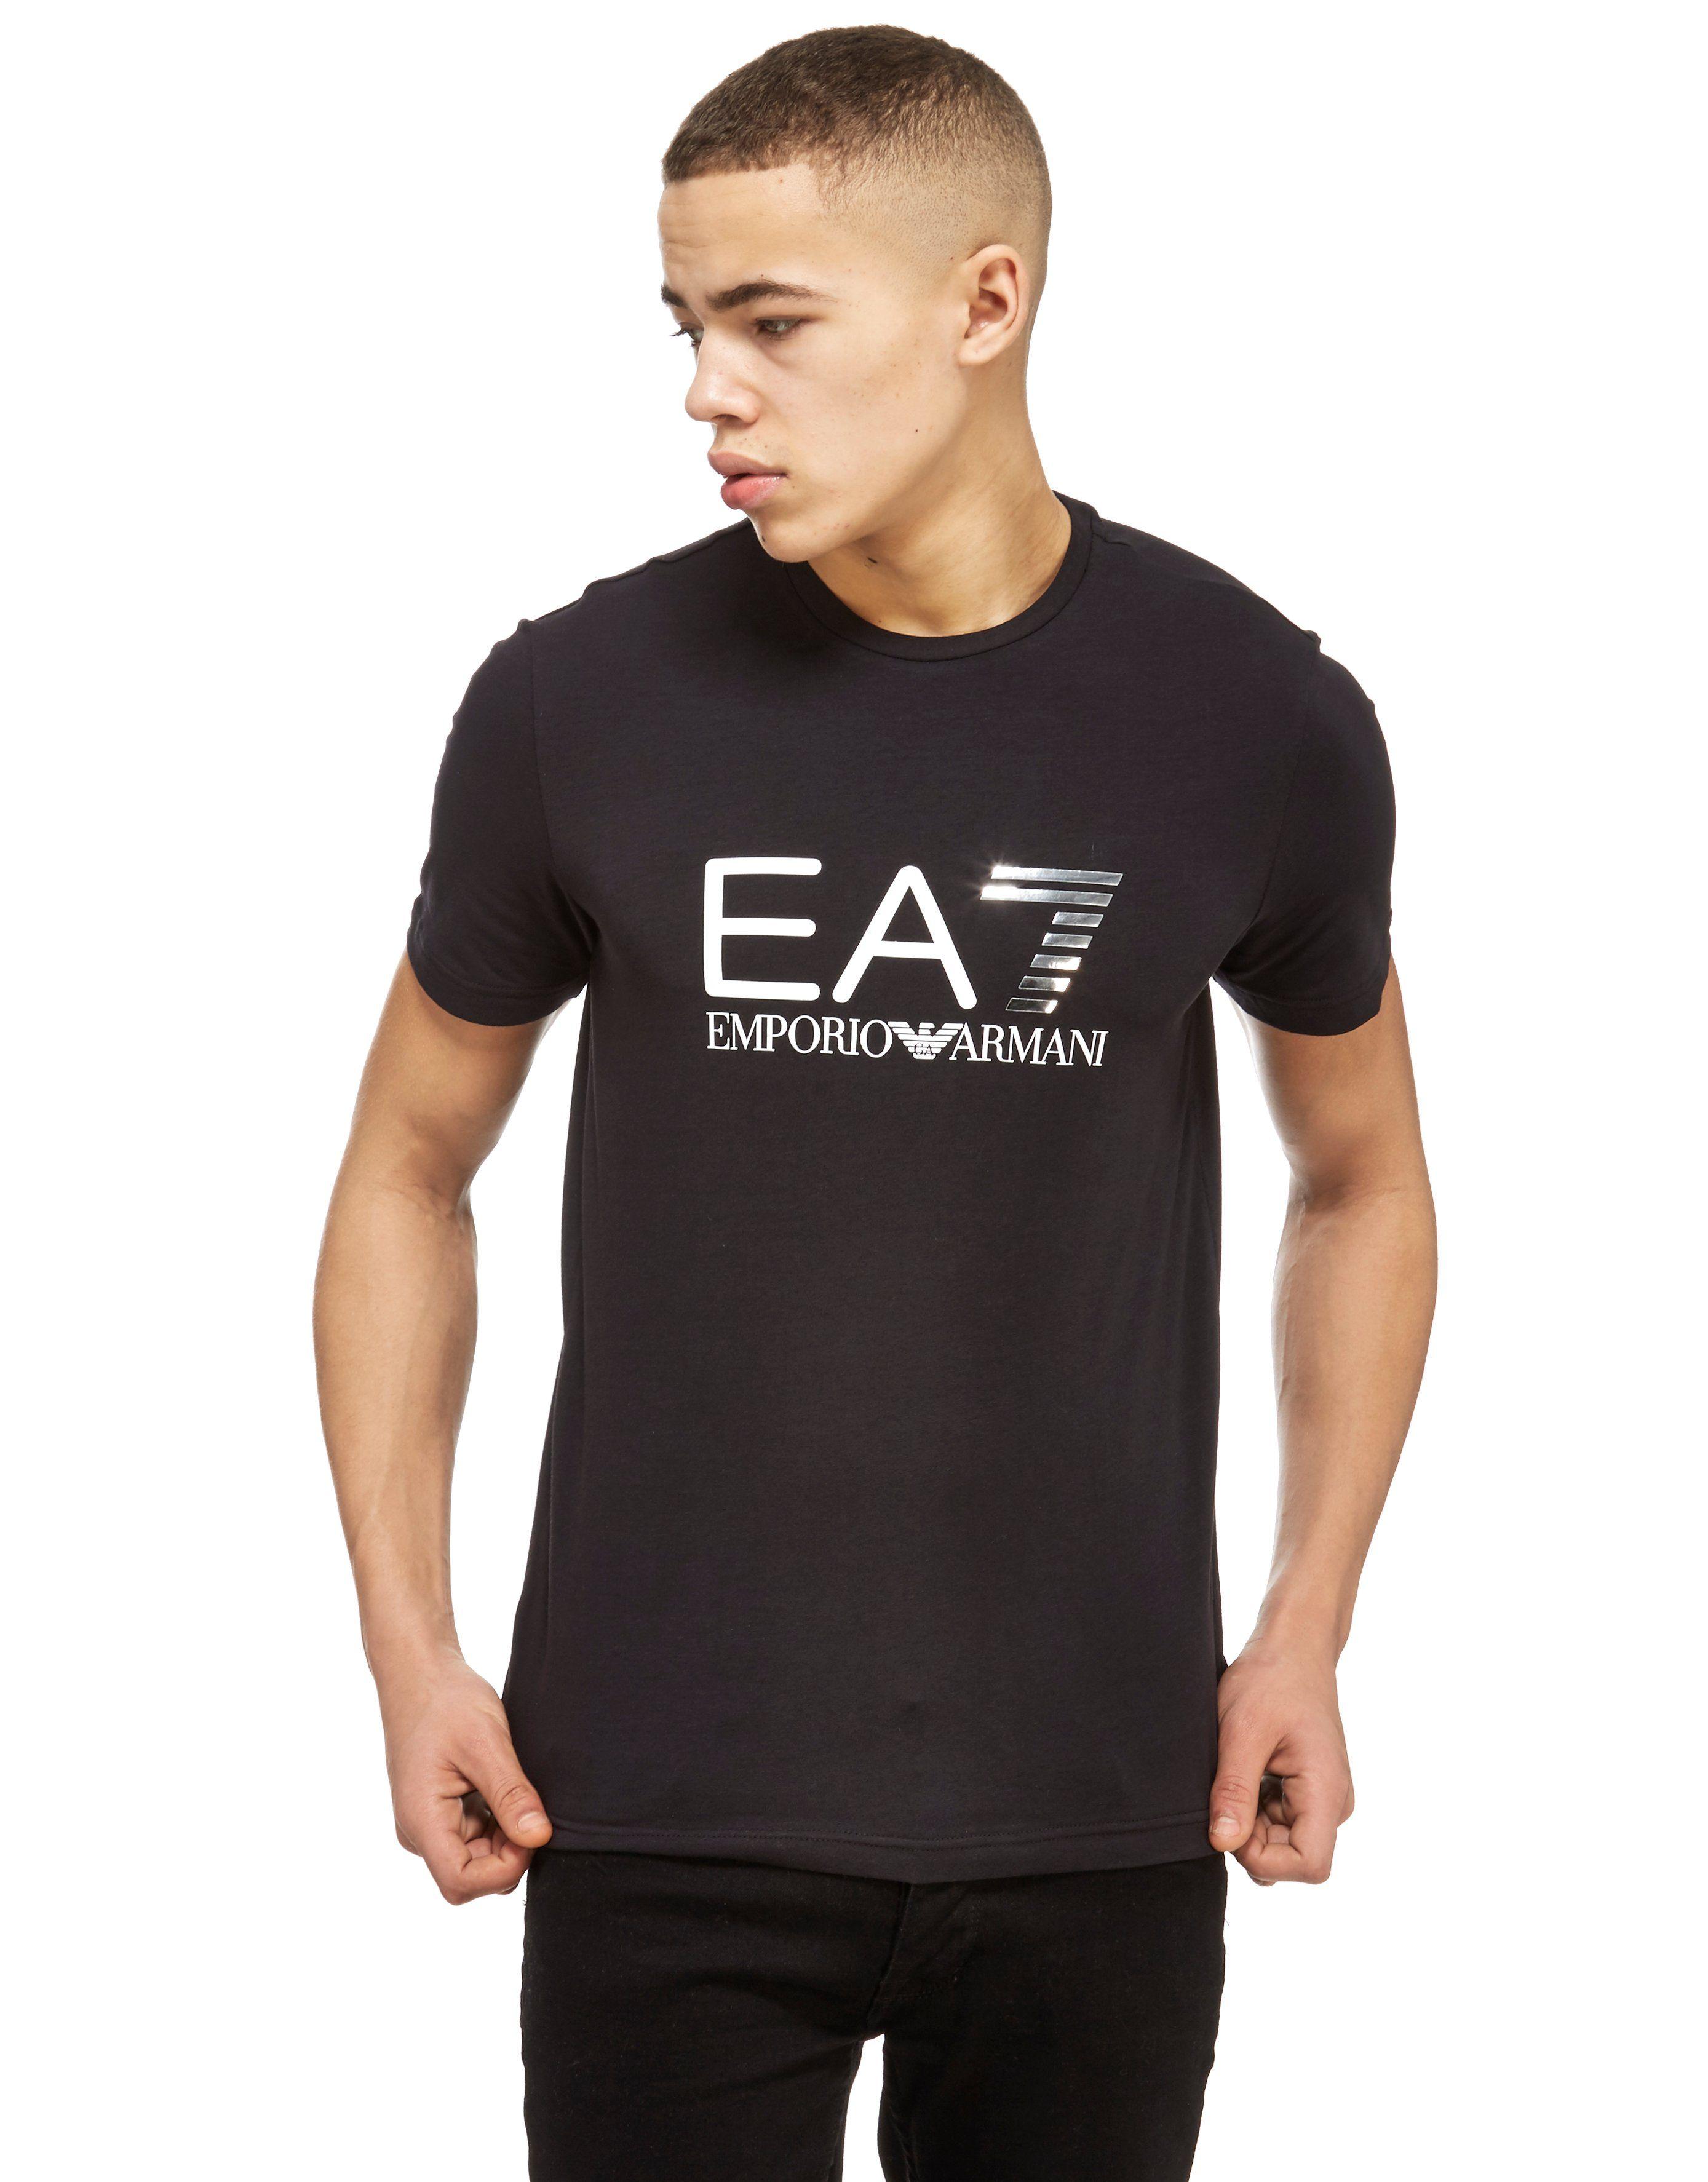 Emporio Armani Ea7 Foil Logo T Shirt Jd Sports